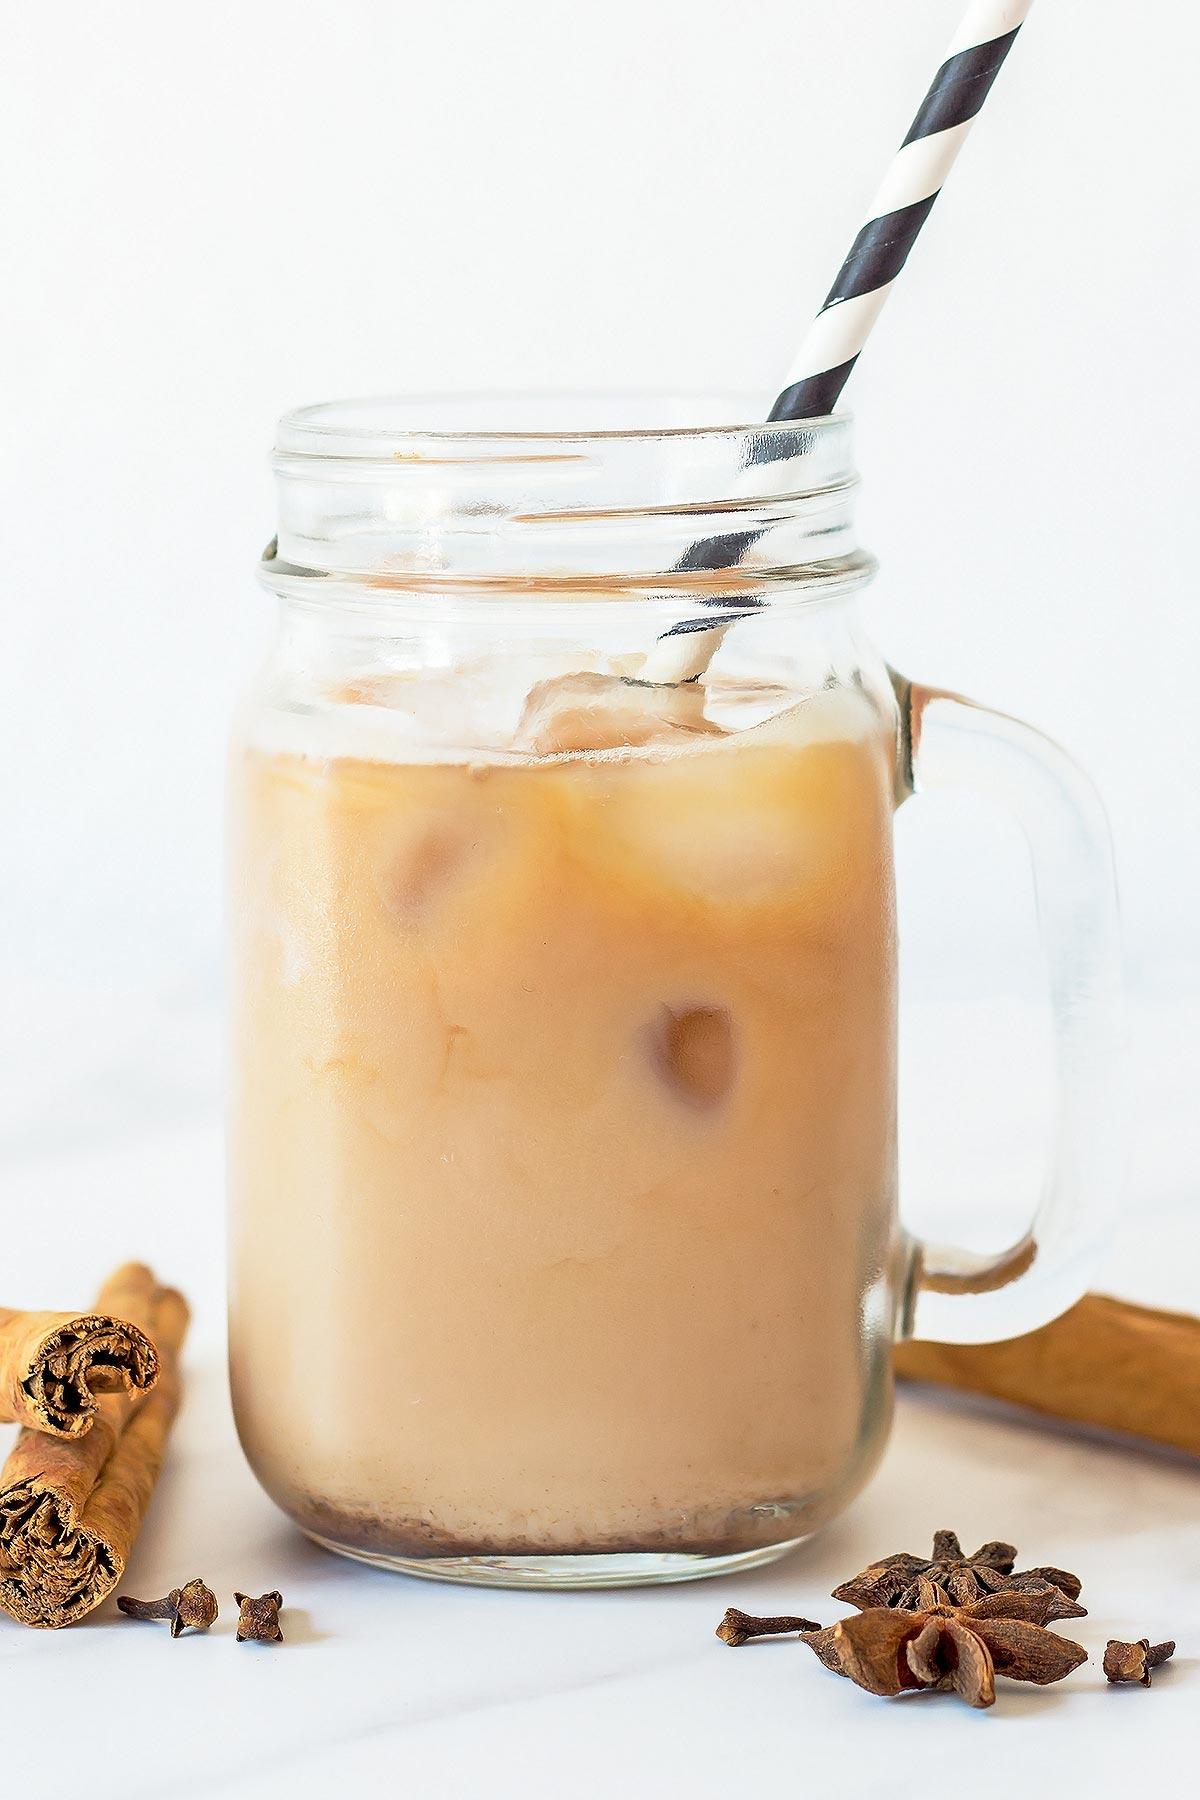 Spiced Iced Tea Latte in Mug